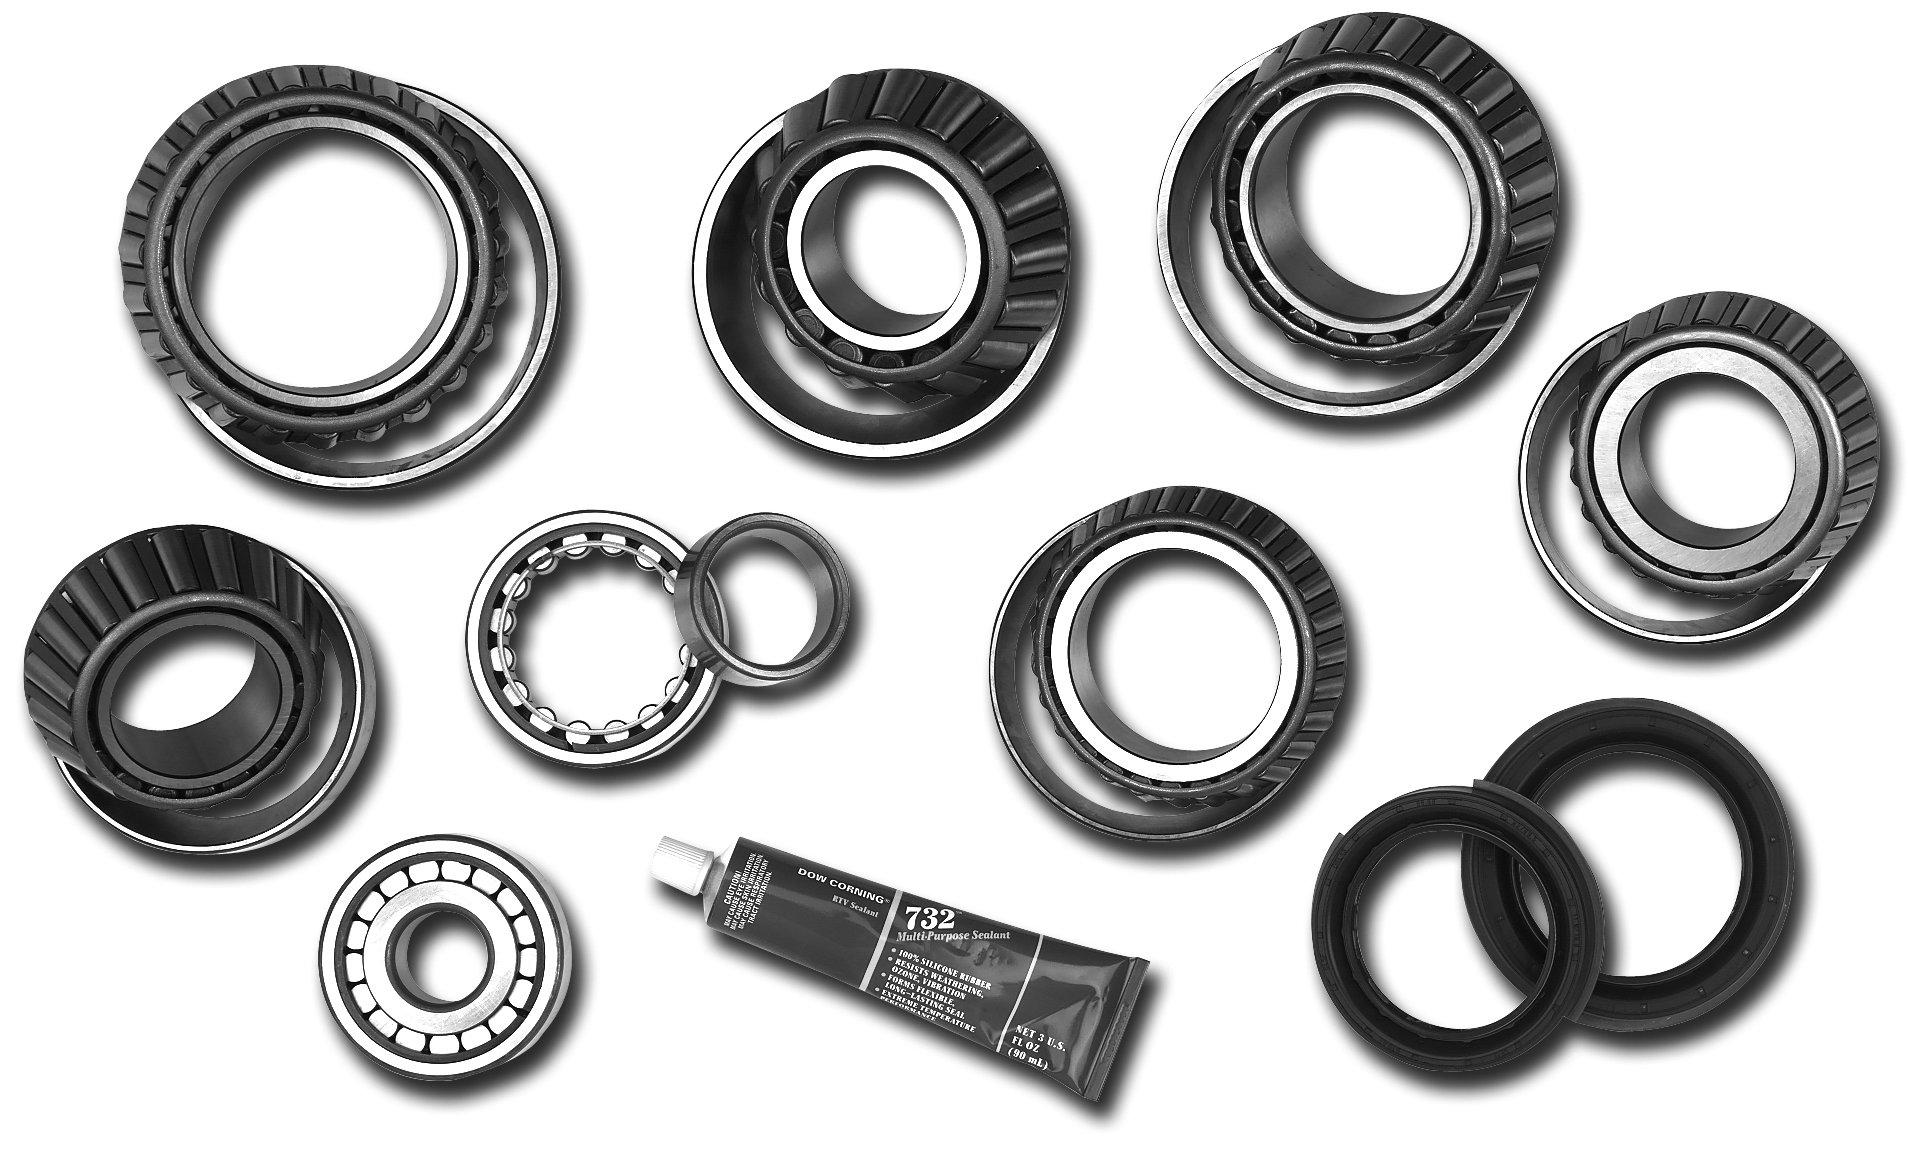 Dana Spicer Axle Bearing Rebuild Kit For 07 09